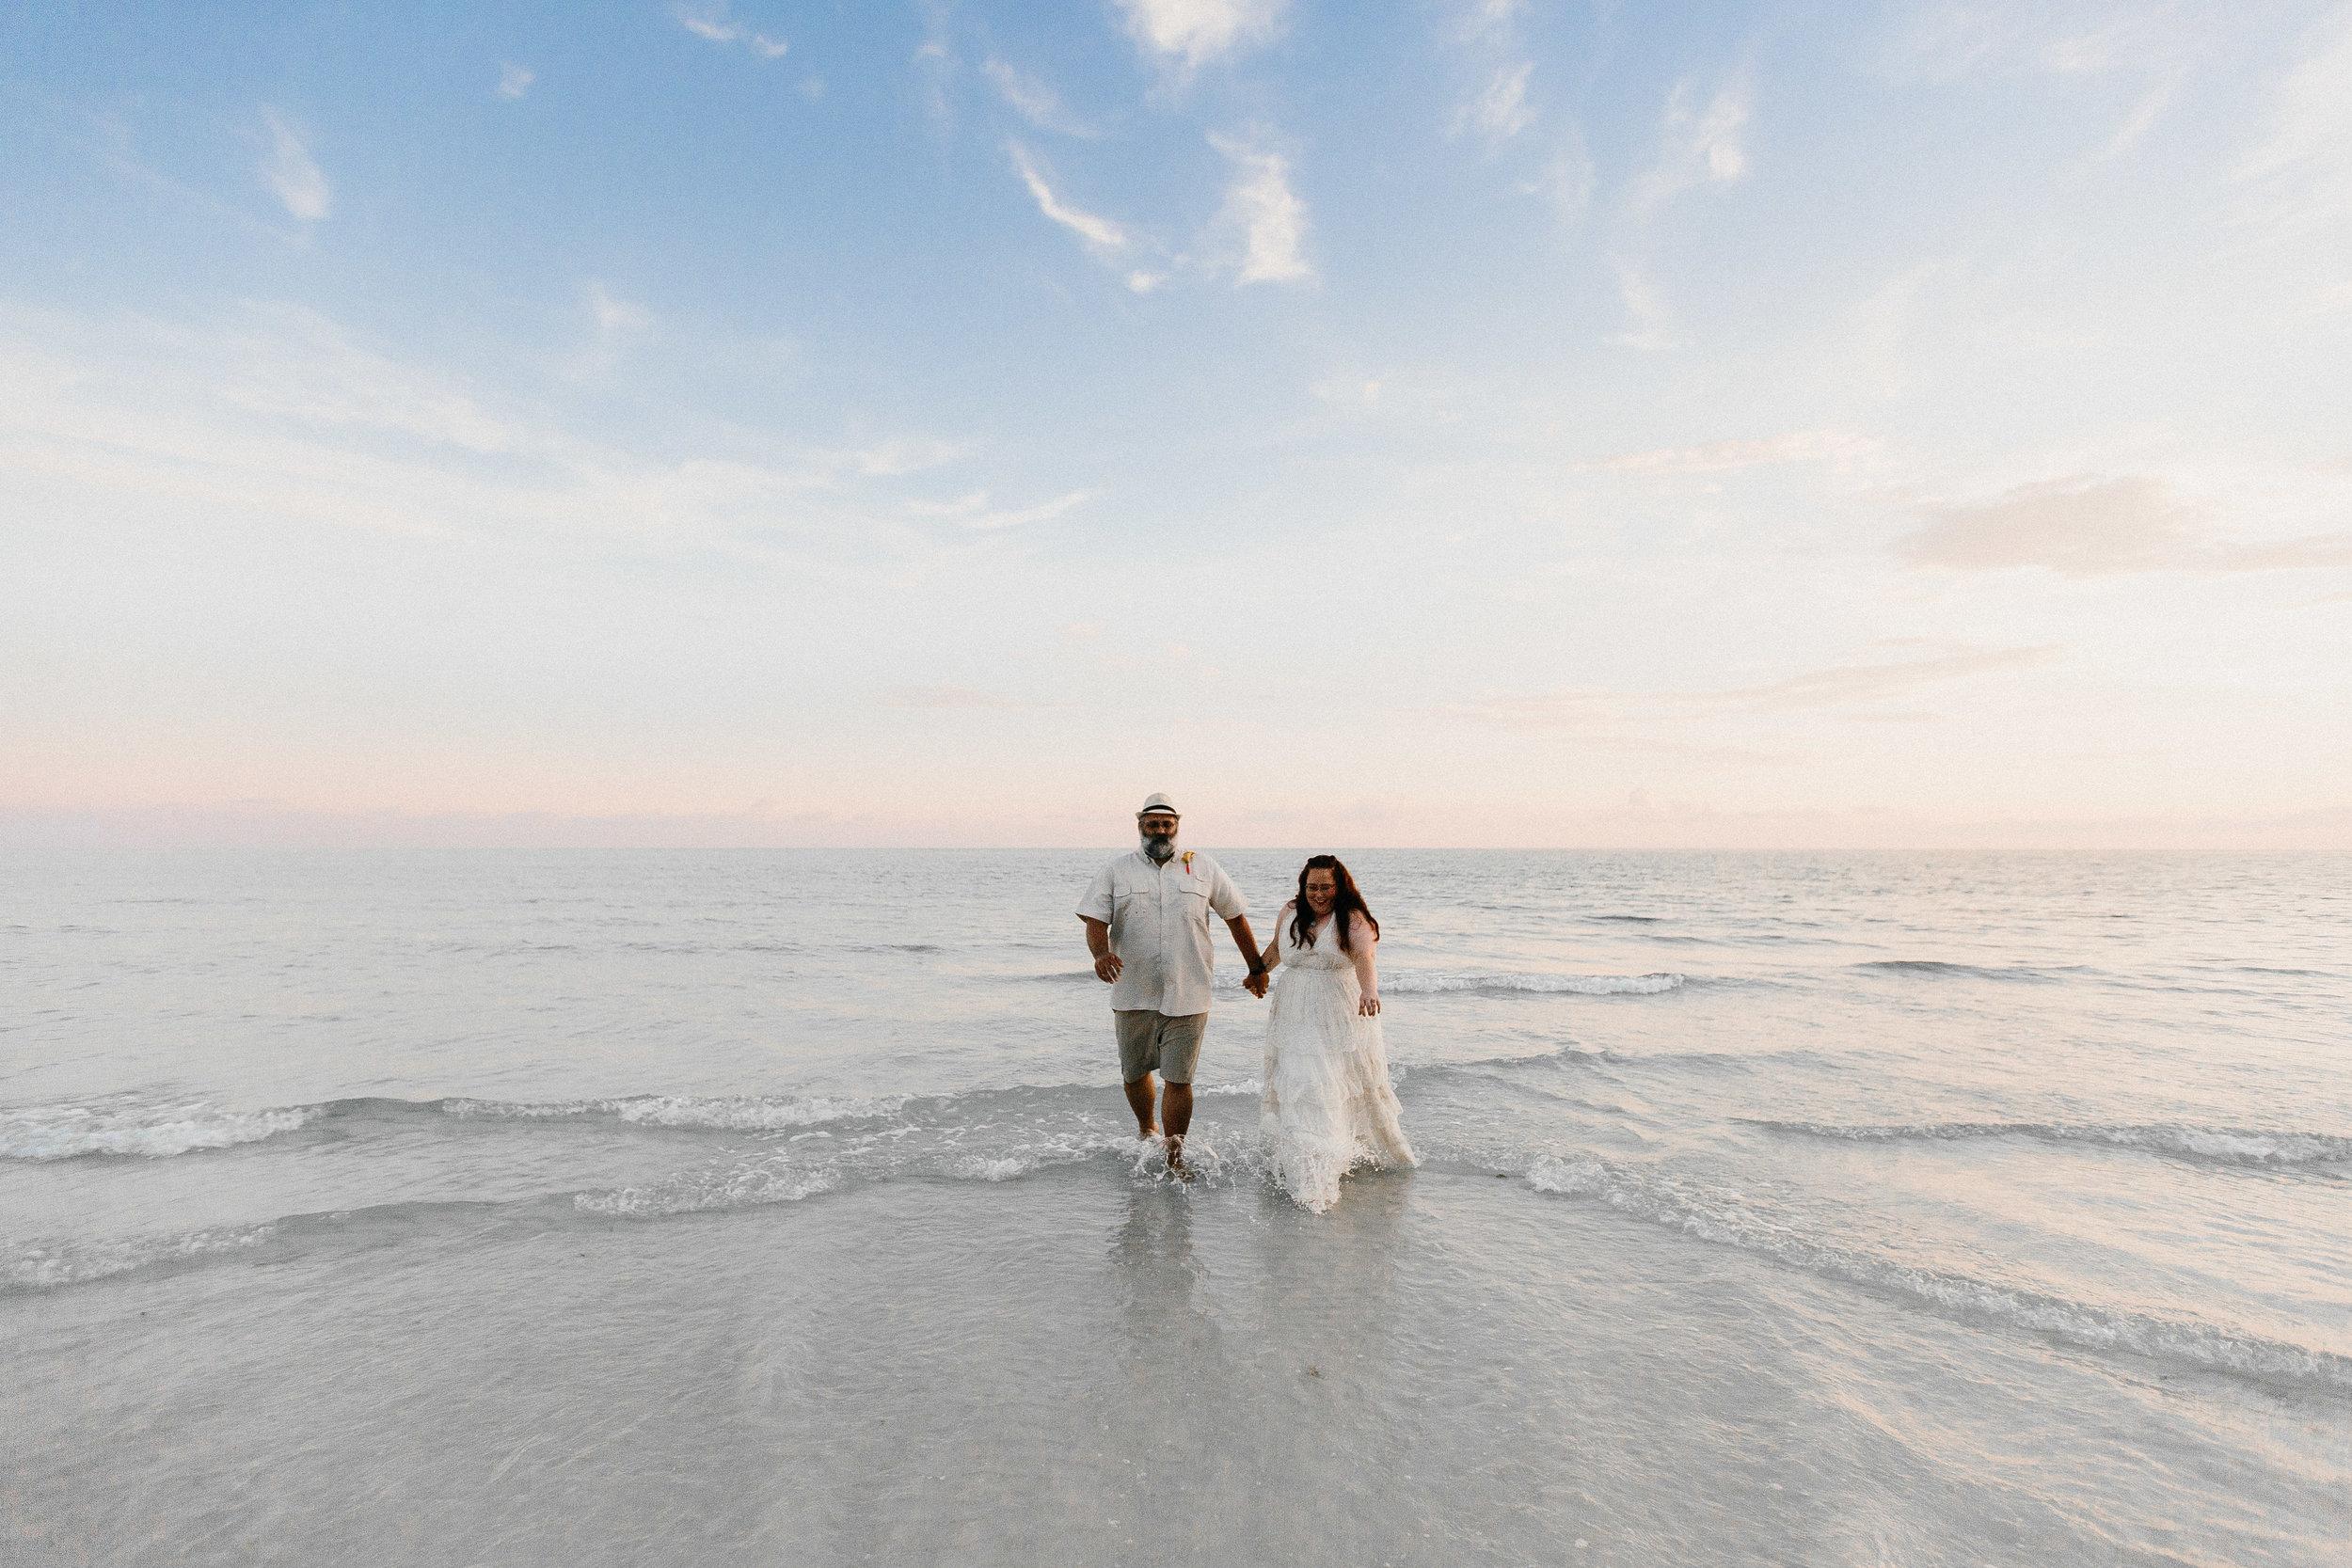 destin_sunset_beach_elopement_intimate_wedding_photographer_florida_documentary_1333.jpg